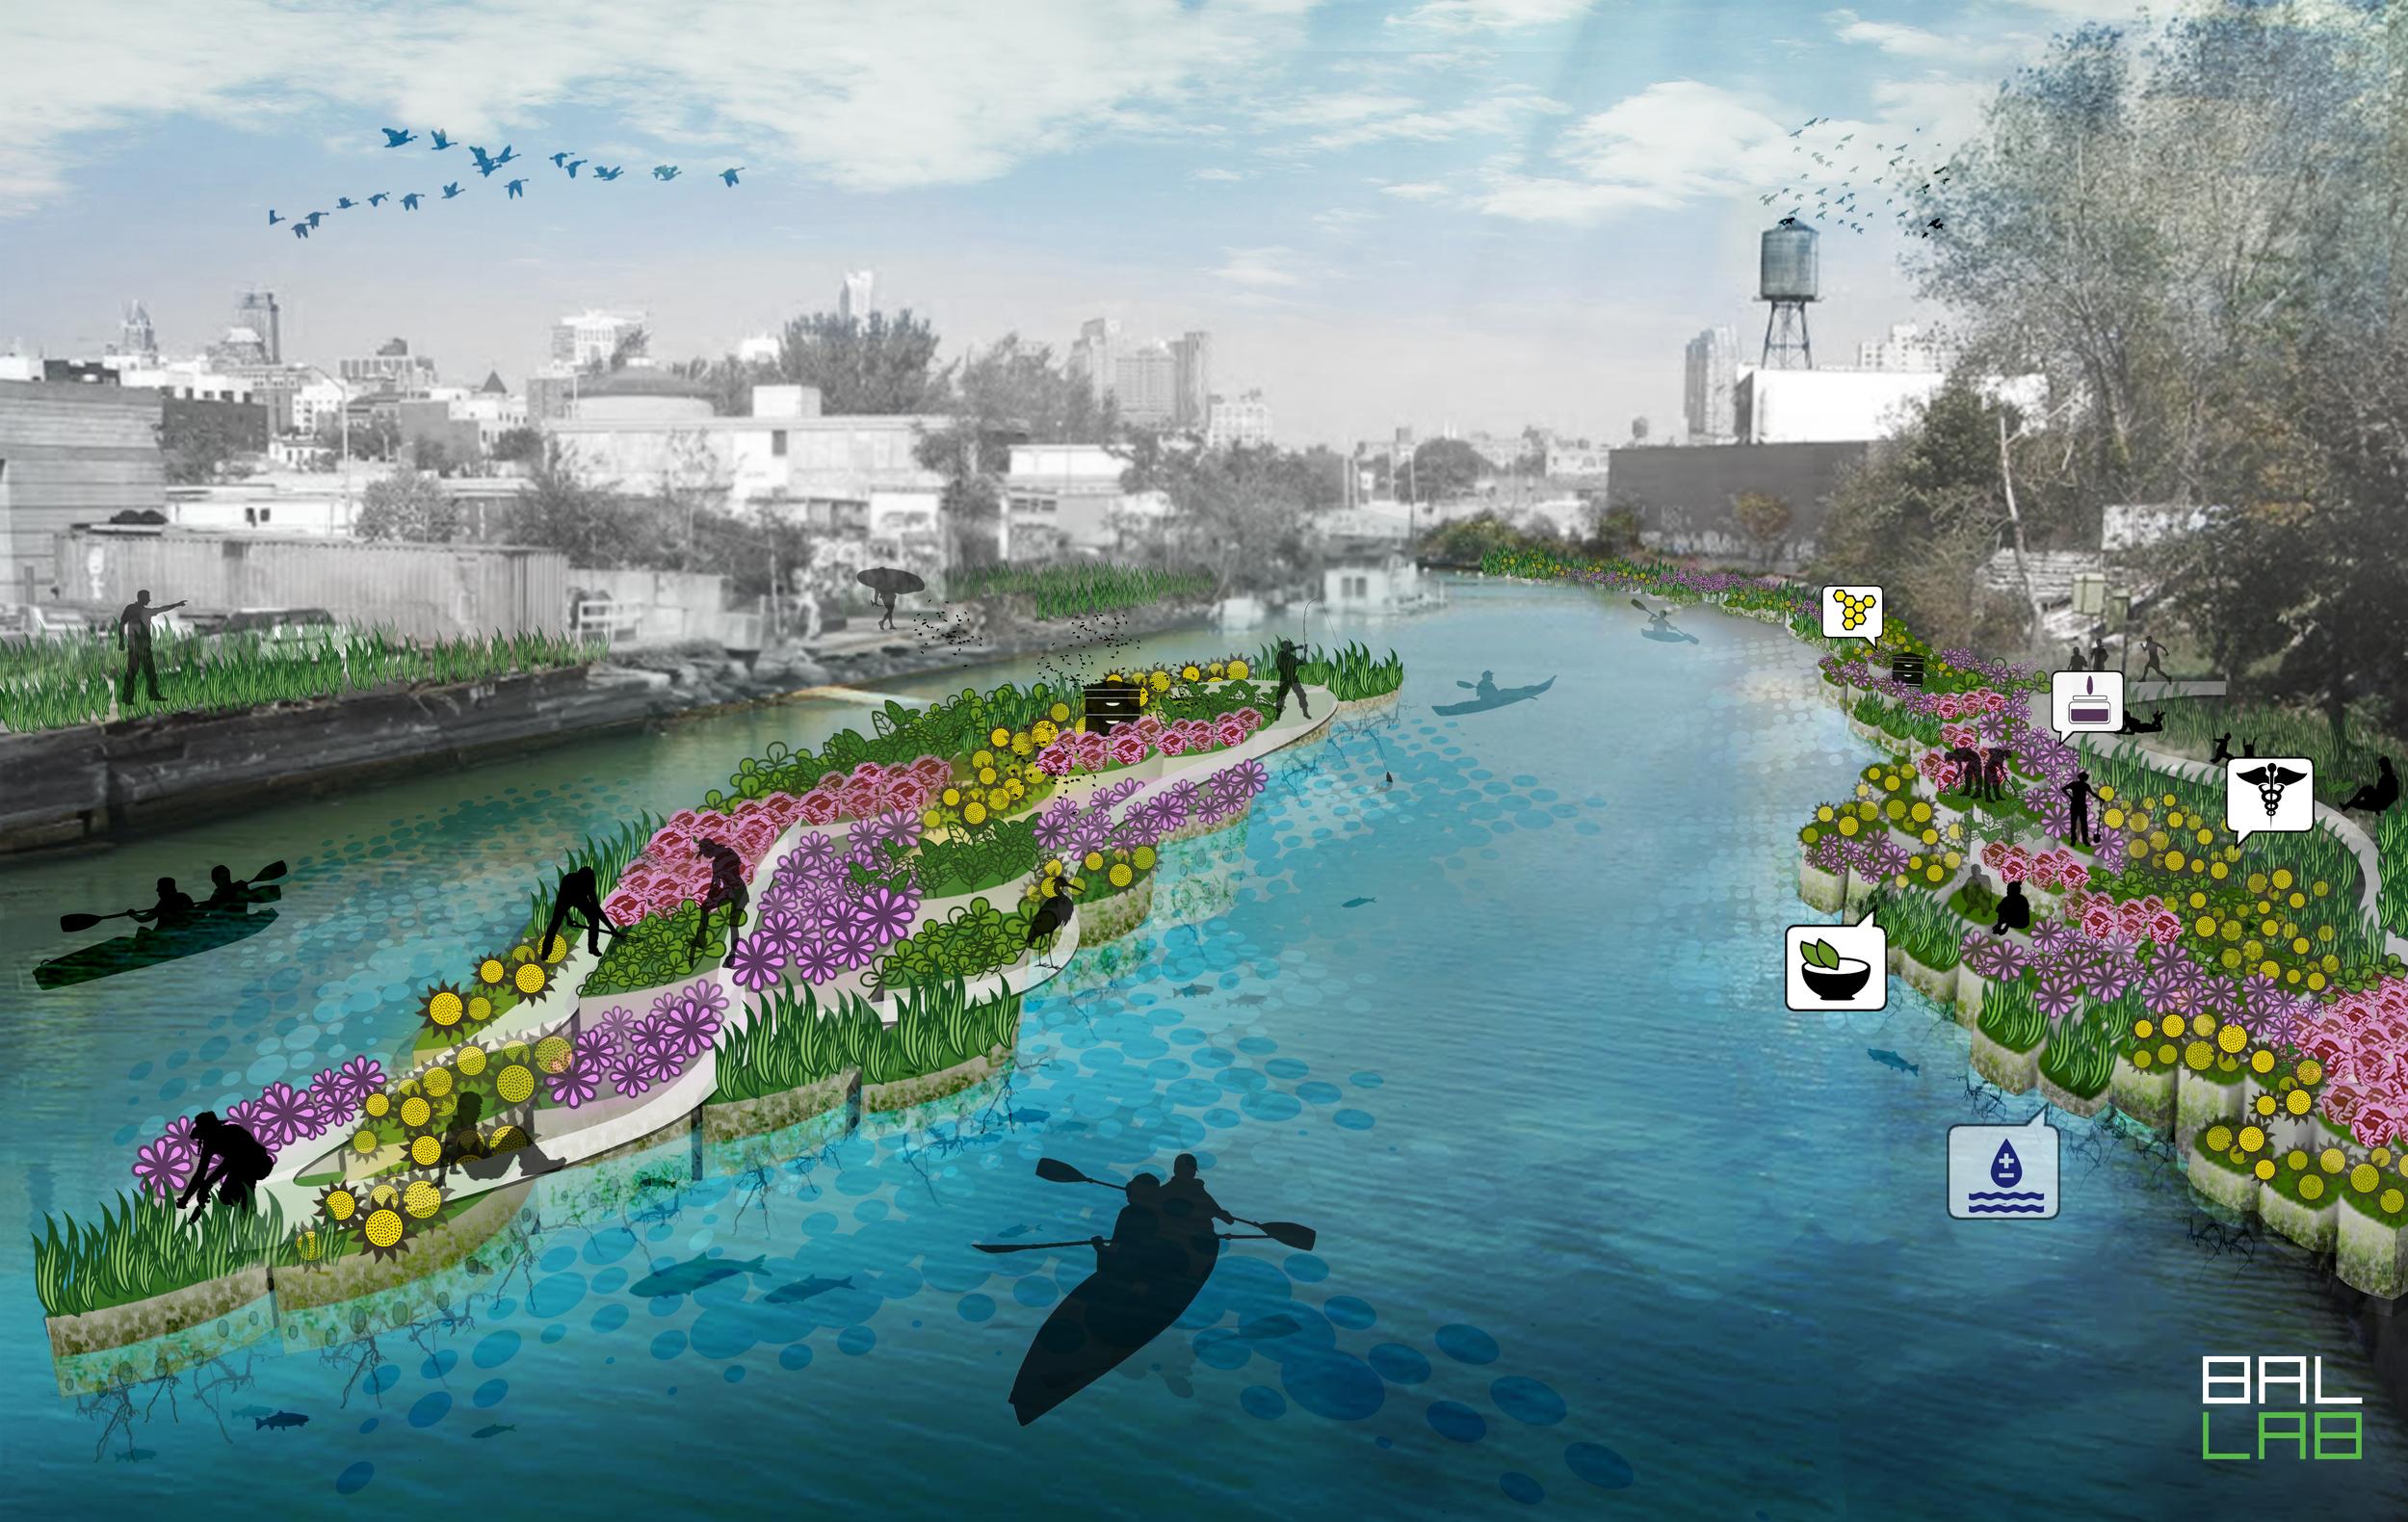 Multi-functional Green Infrastructure,Gowanus Canal,Brooklyn, 2015